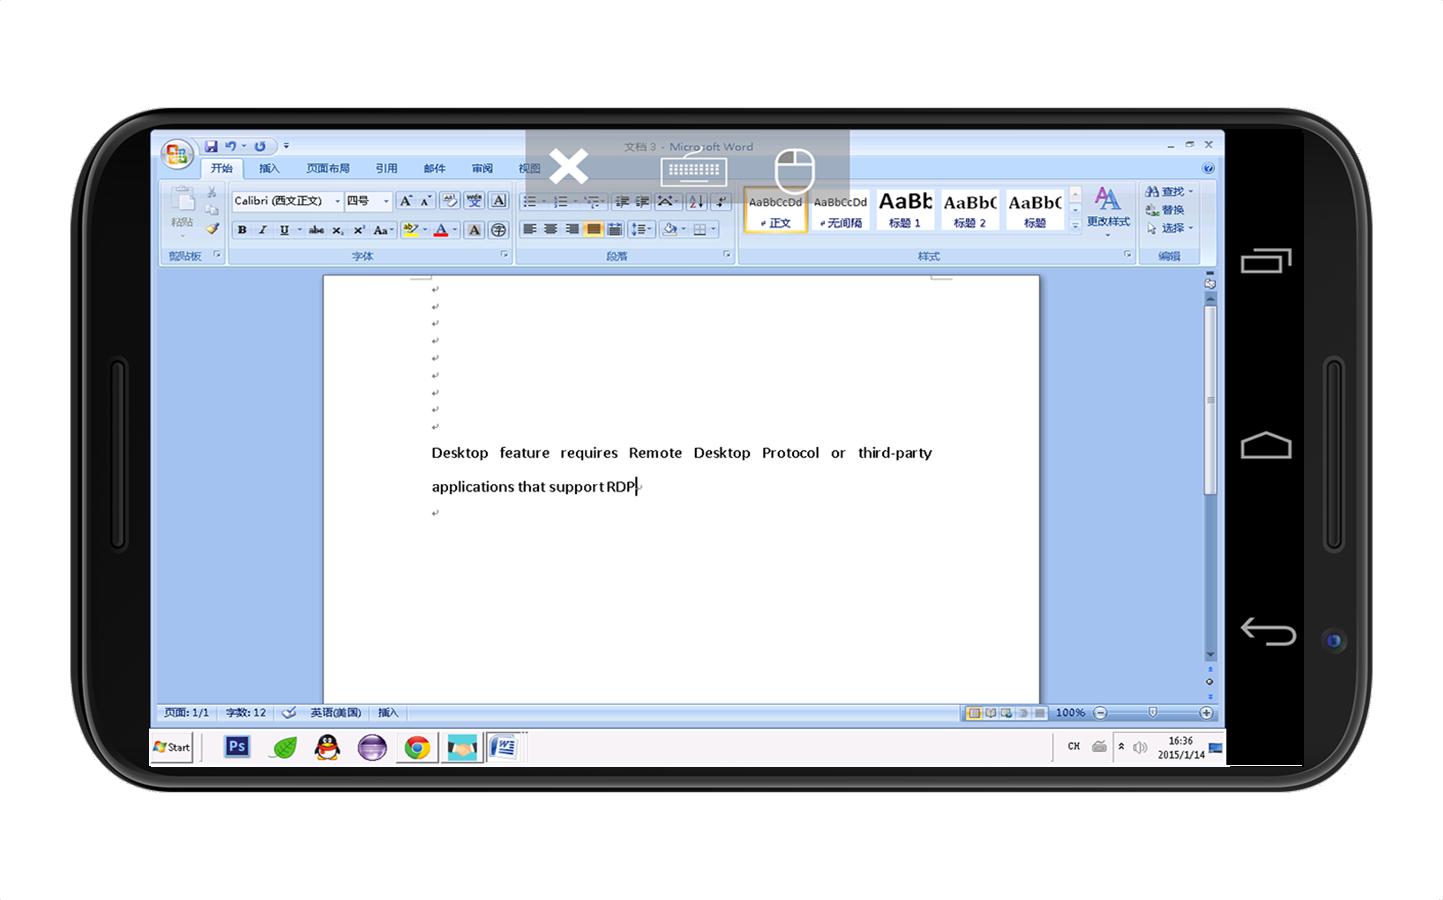 Скачать wifi mouse: keyboard trackpad, computer controller 3. 5. 8.